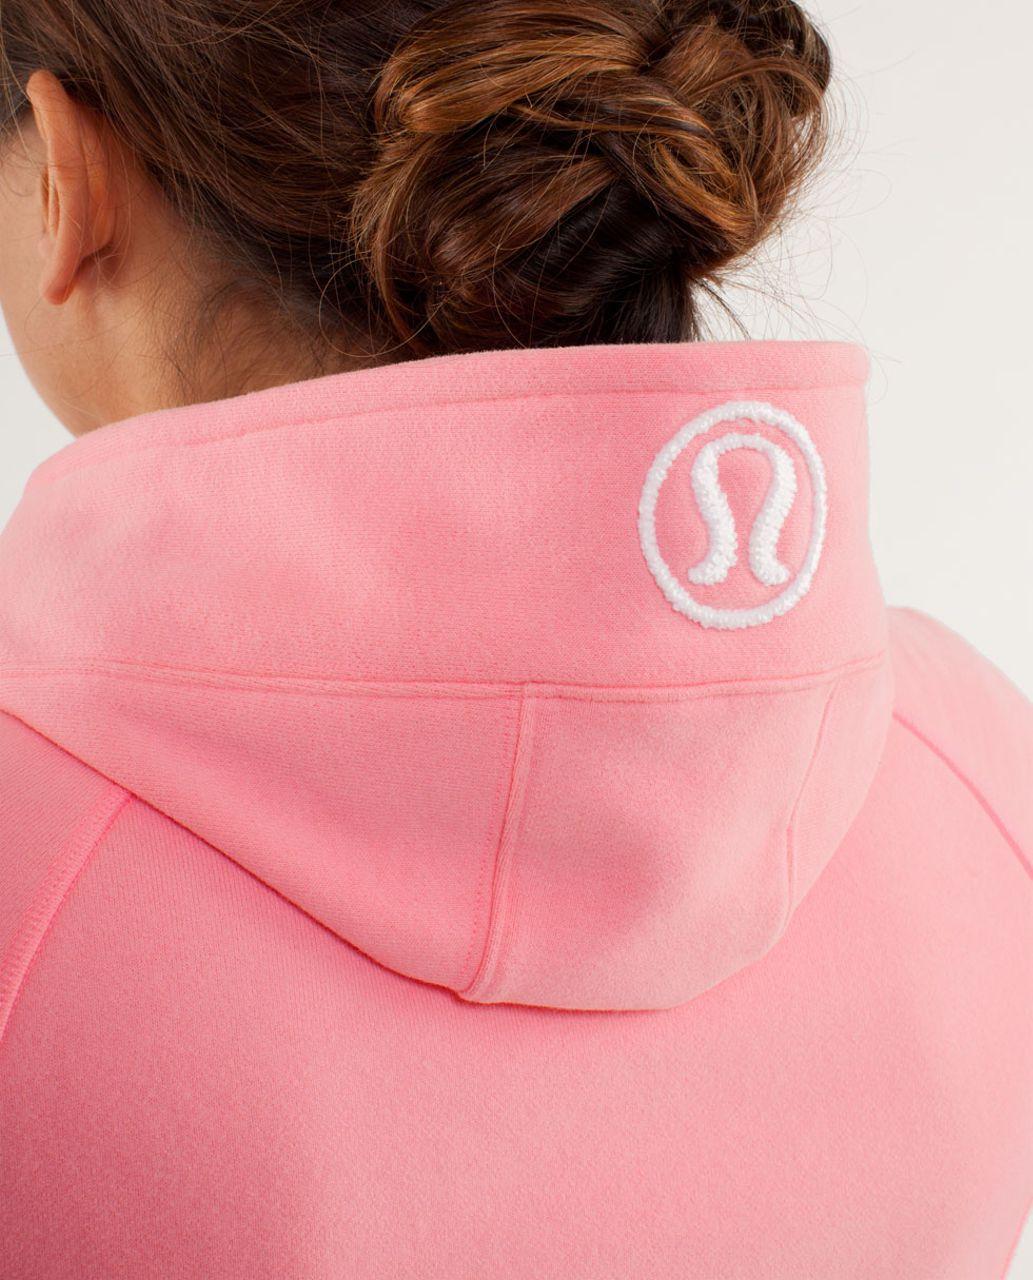 Lululemon Scuba Hoodie *Stretch - Pink Shell